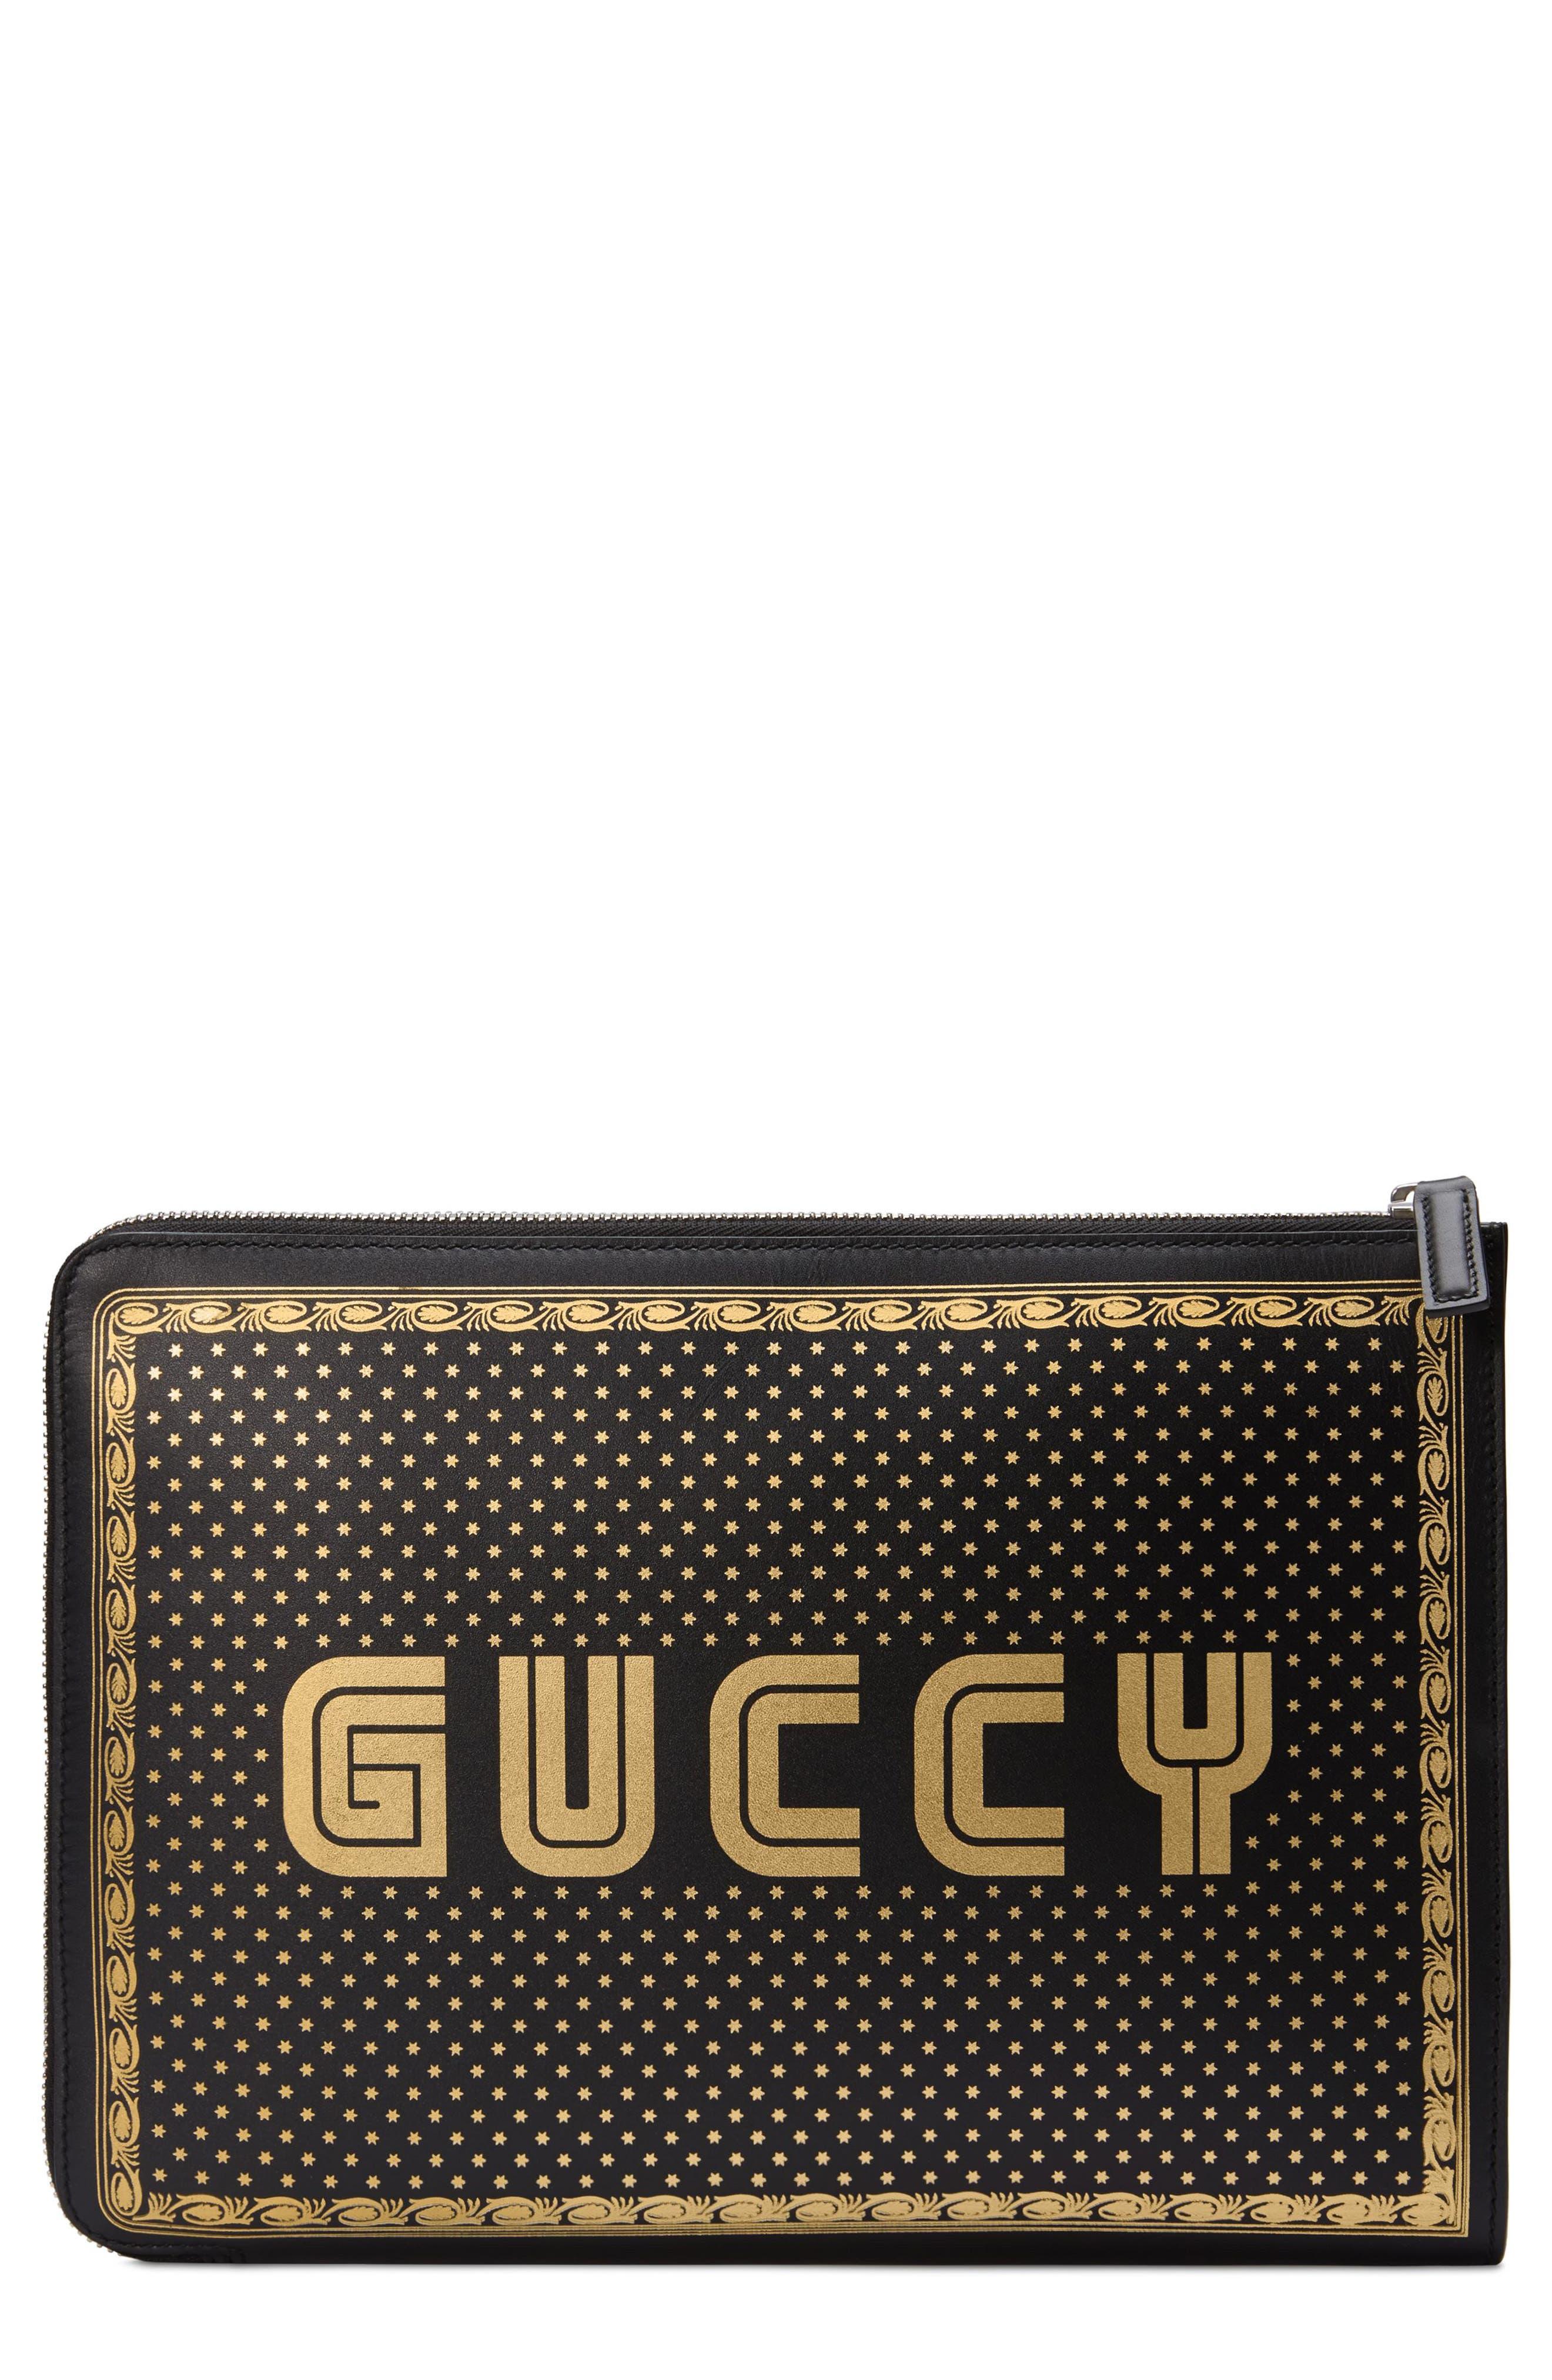 GUCCI, Guccy Logo Moon & Stars Leather Clutch, Main thumbnail 1, color, NERO ORO/ NERO